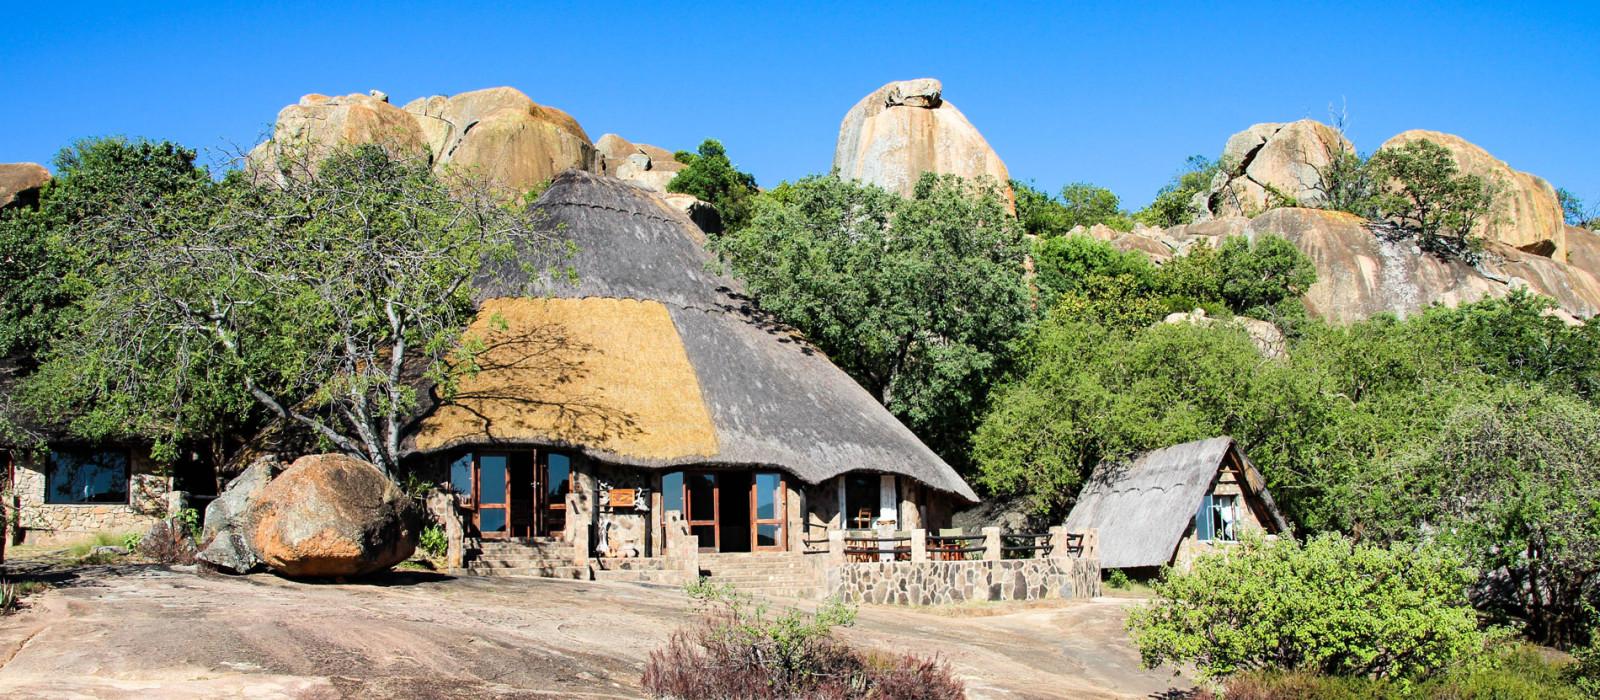 Reiseziel Bulawayo Simbabwe